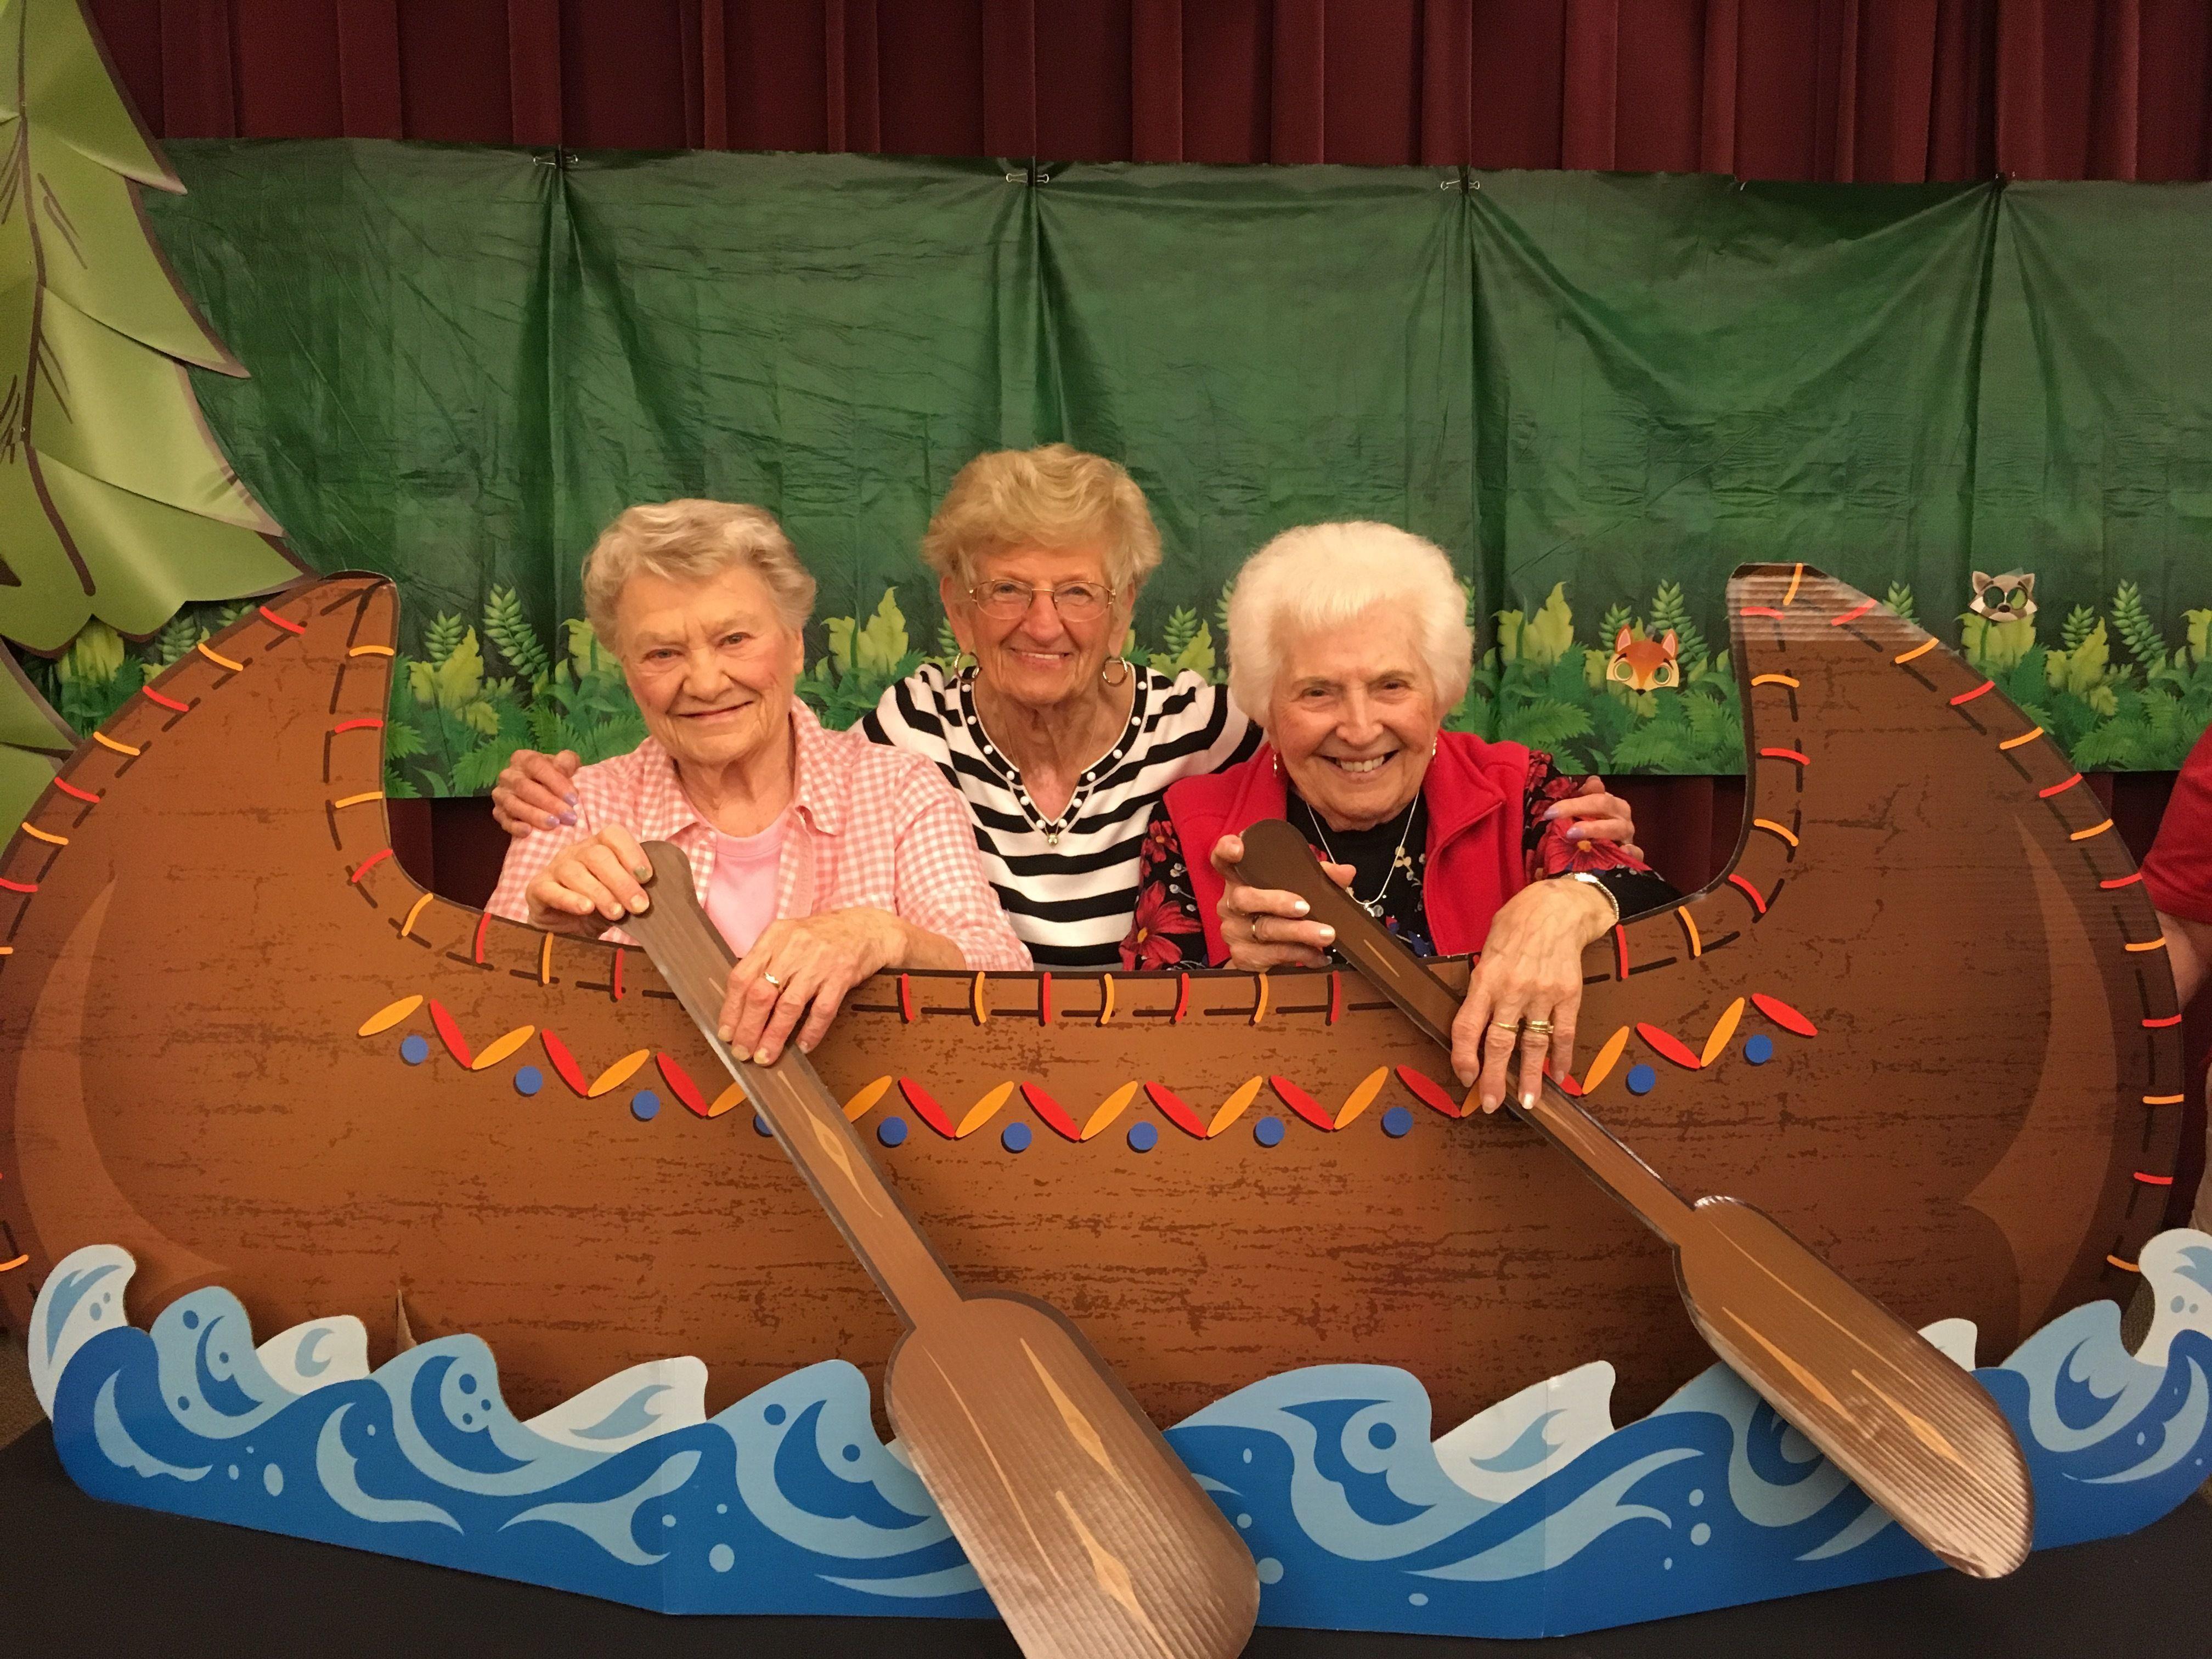 Three Coburg Village residents rowing a fake canoe